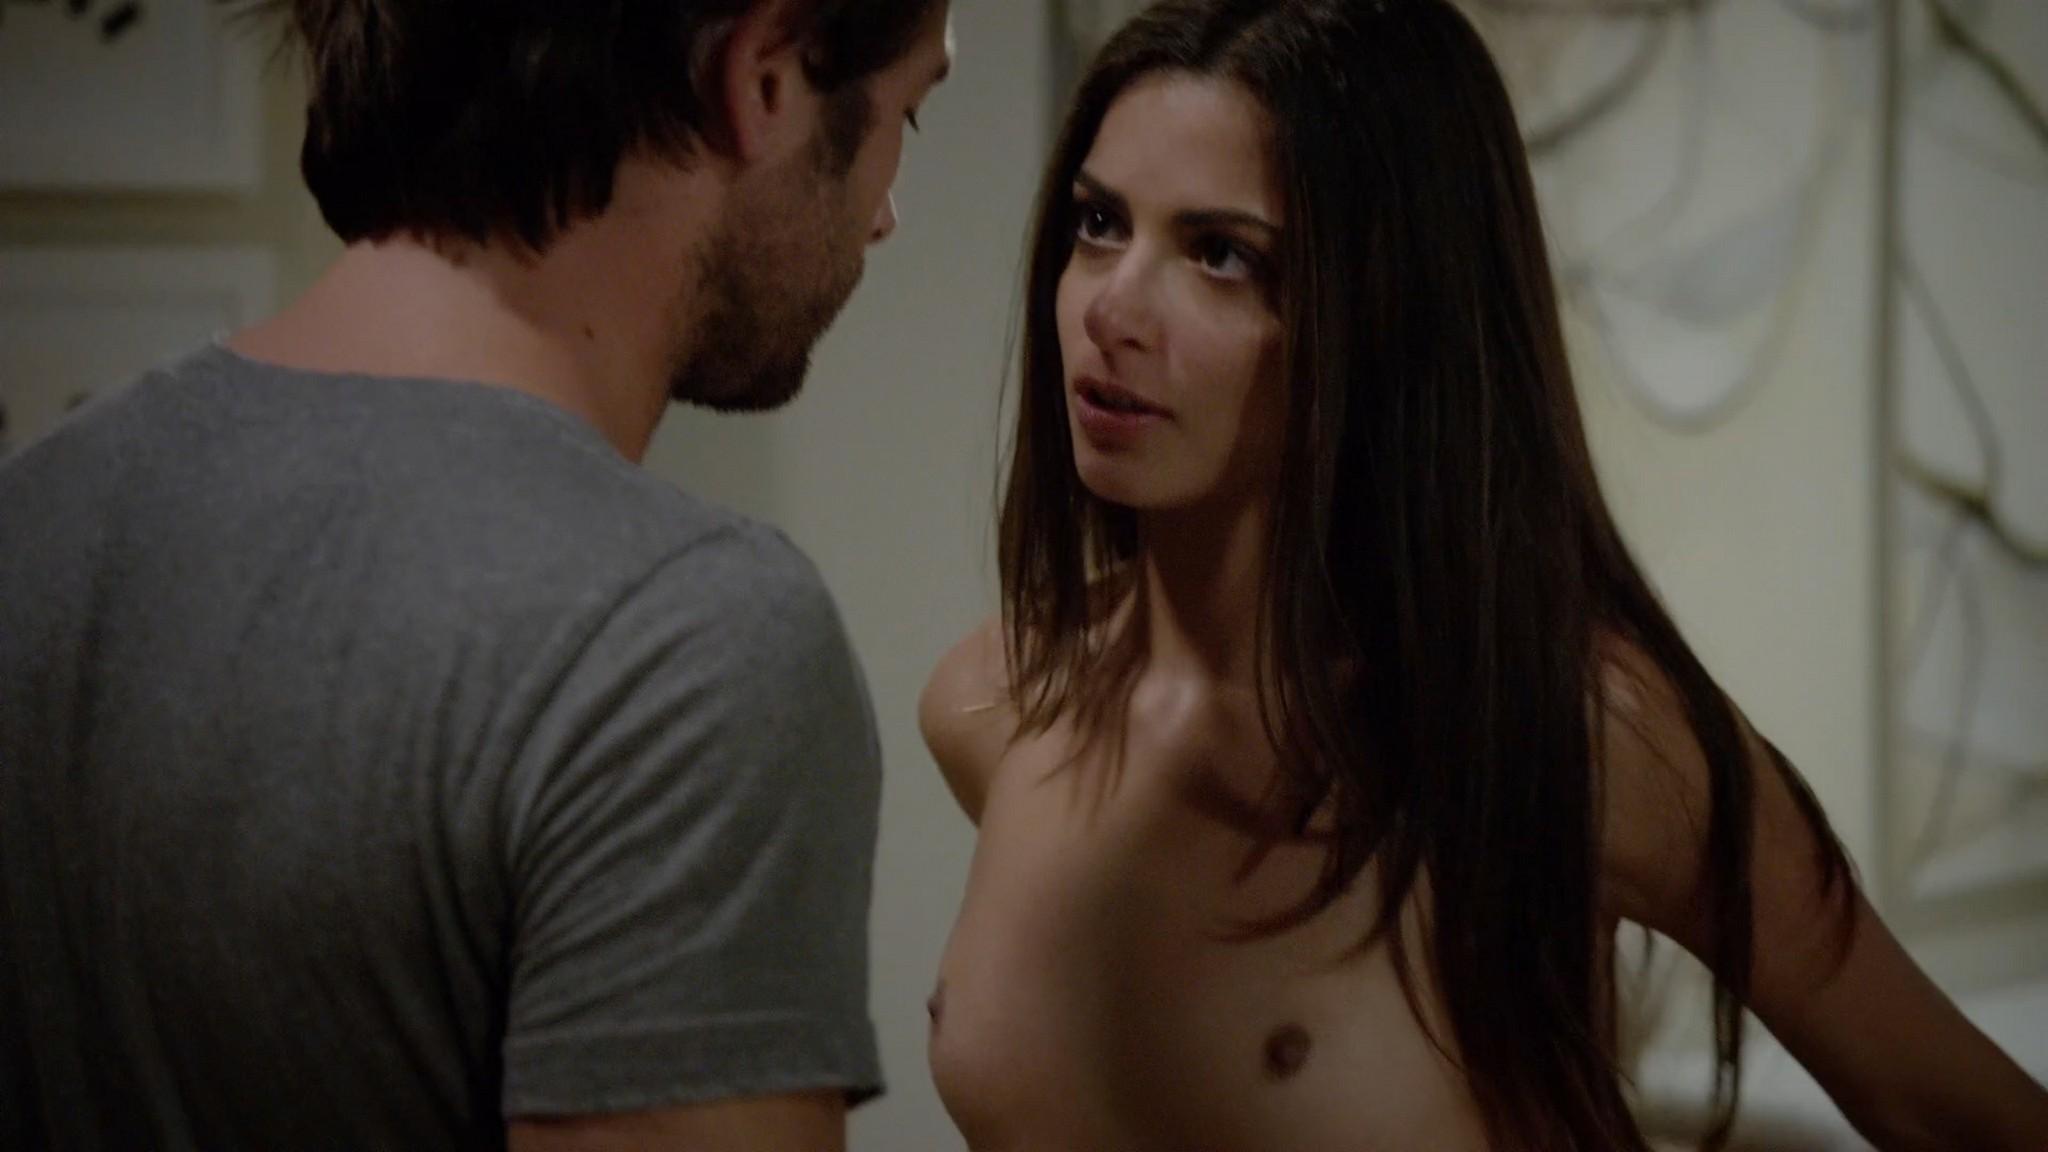 Stephanie Fantauzzi butt naked and topless - Shameless s3e7 (2013) HD 1080p (6)